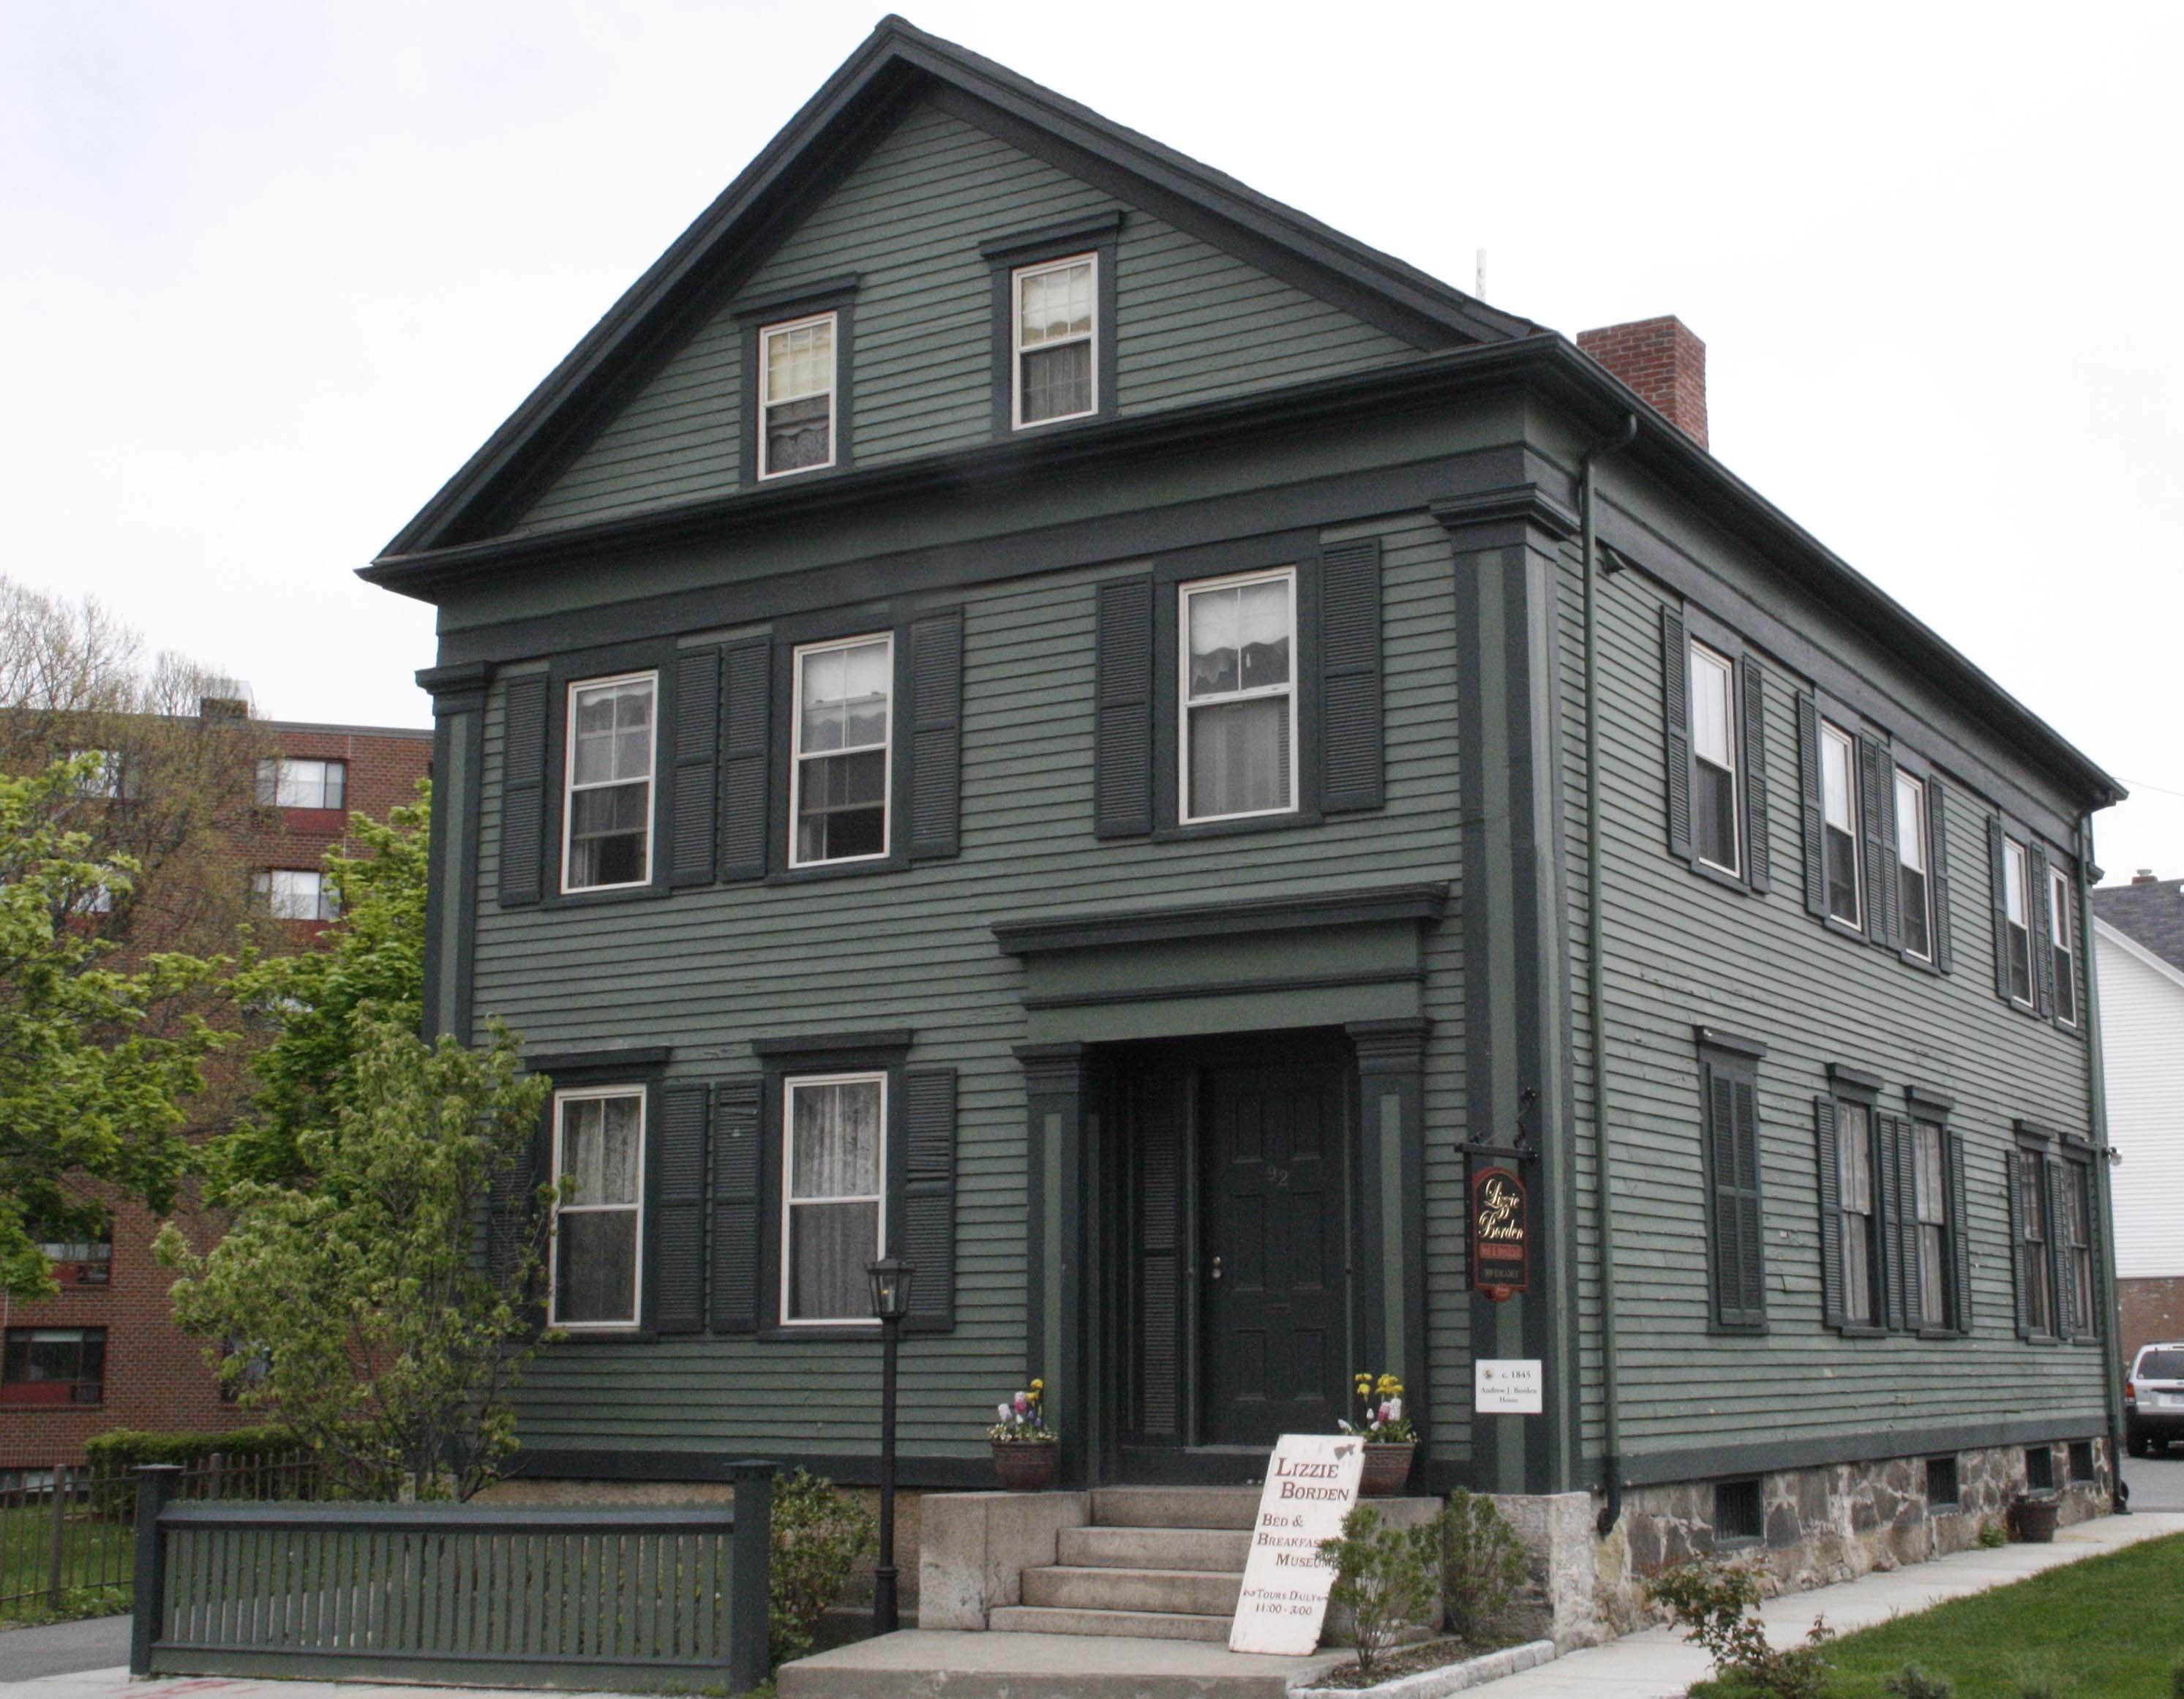 Lizzie_Borden_House